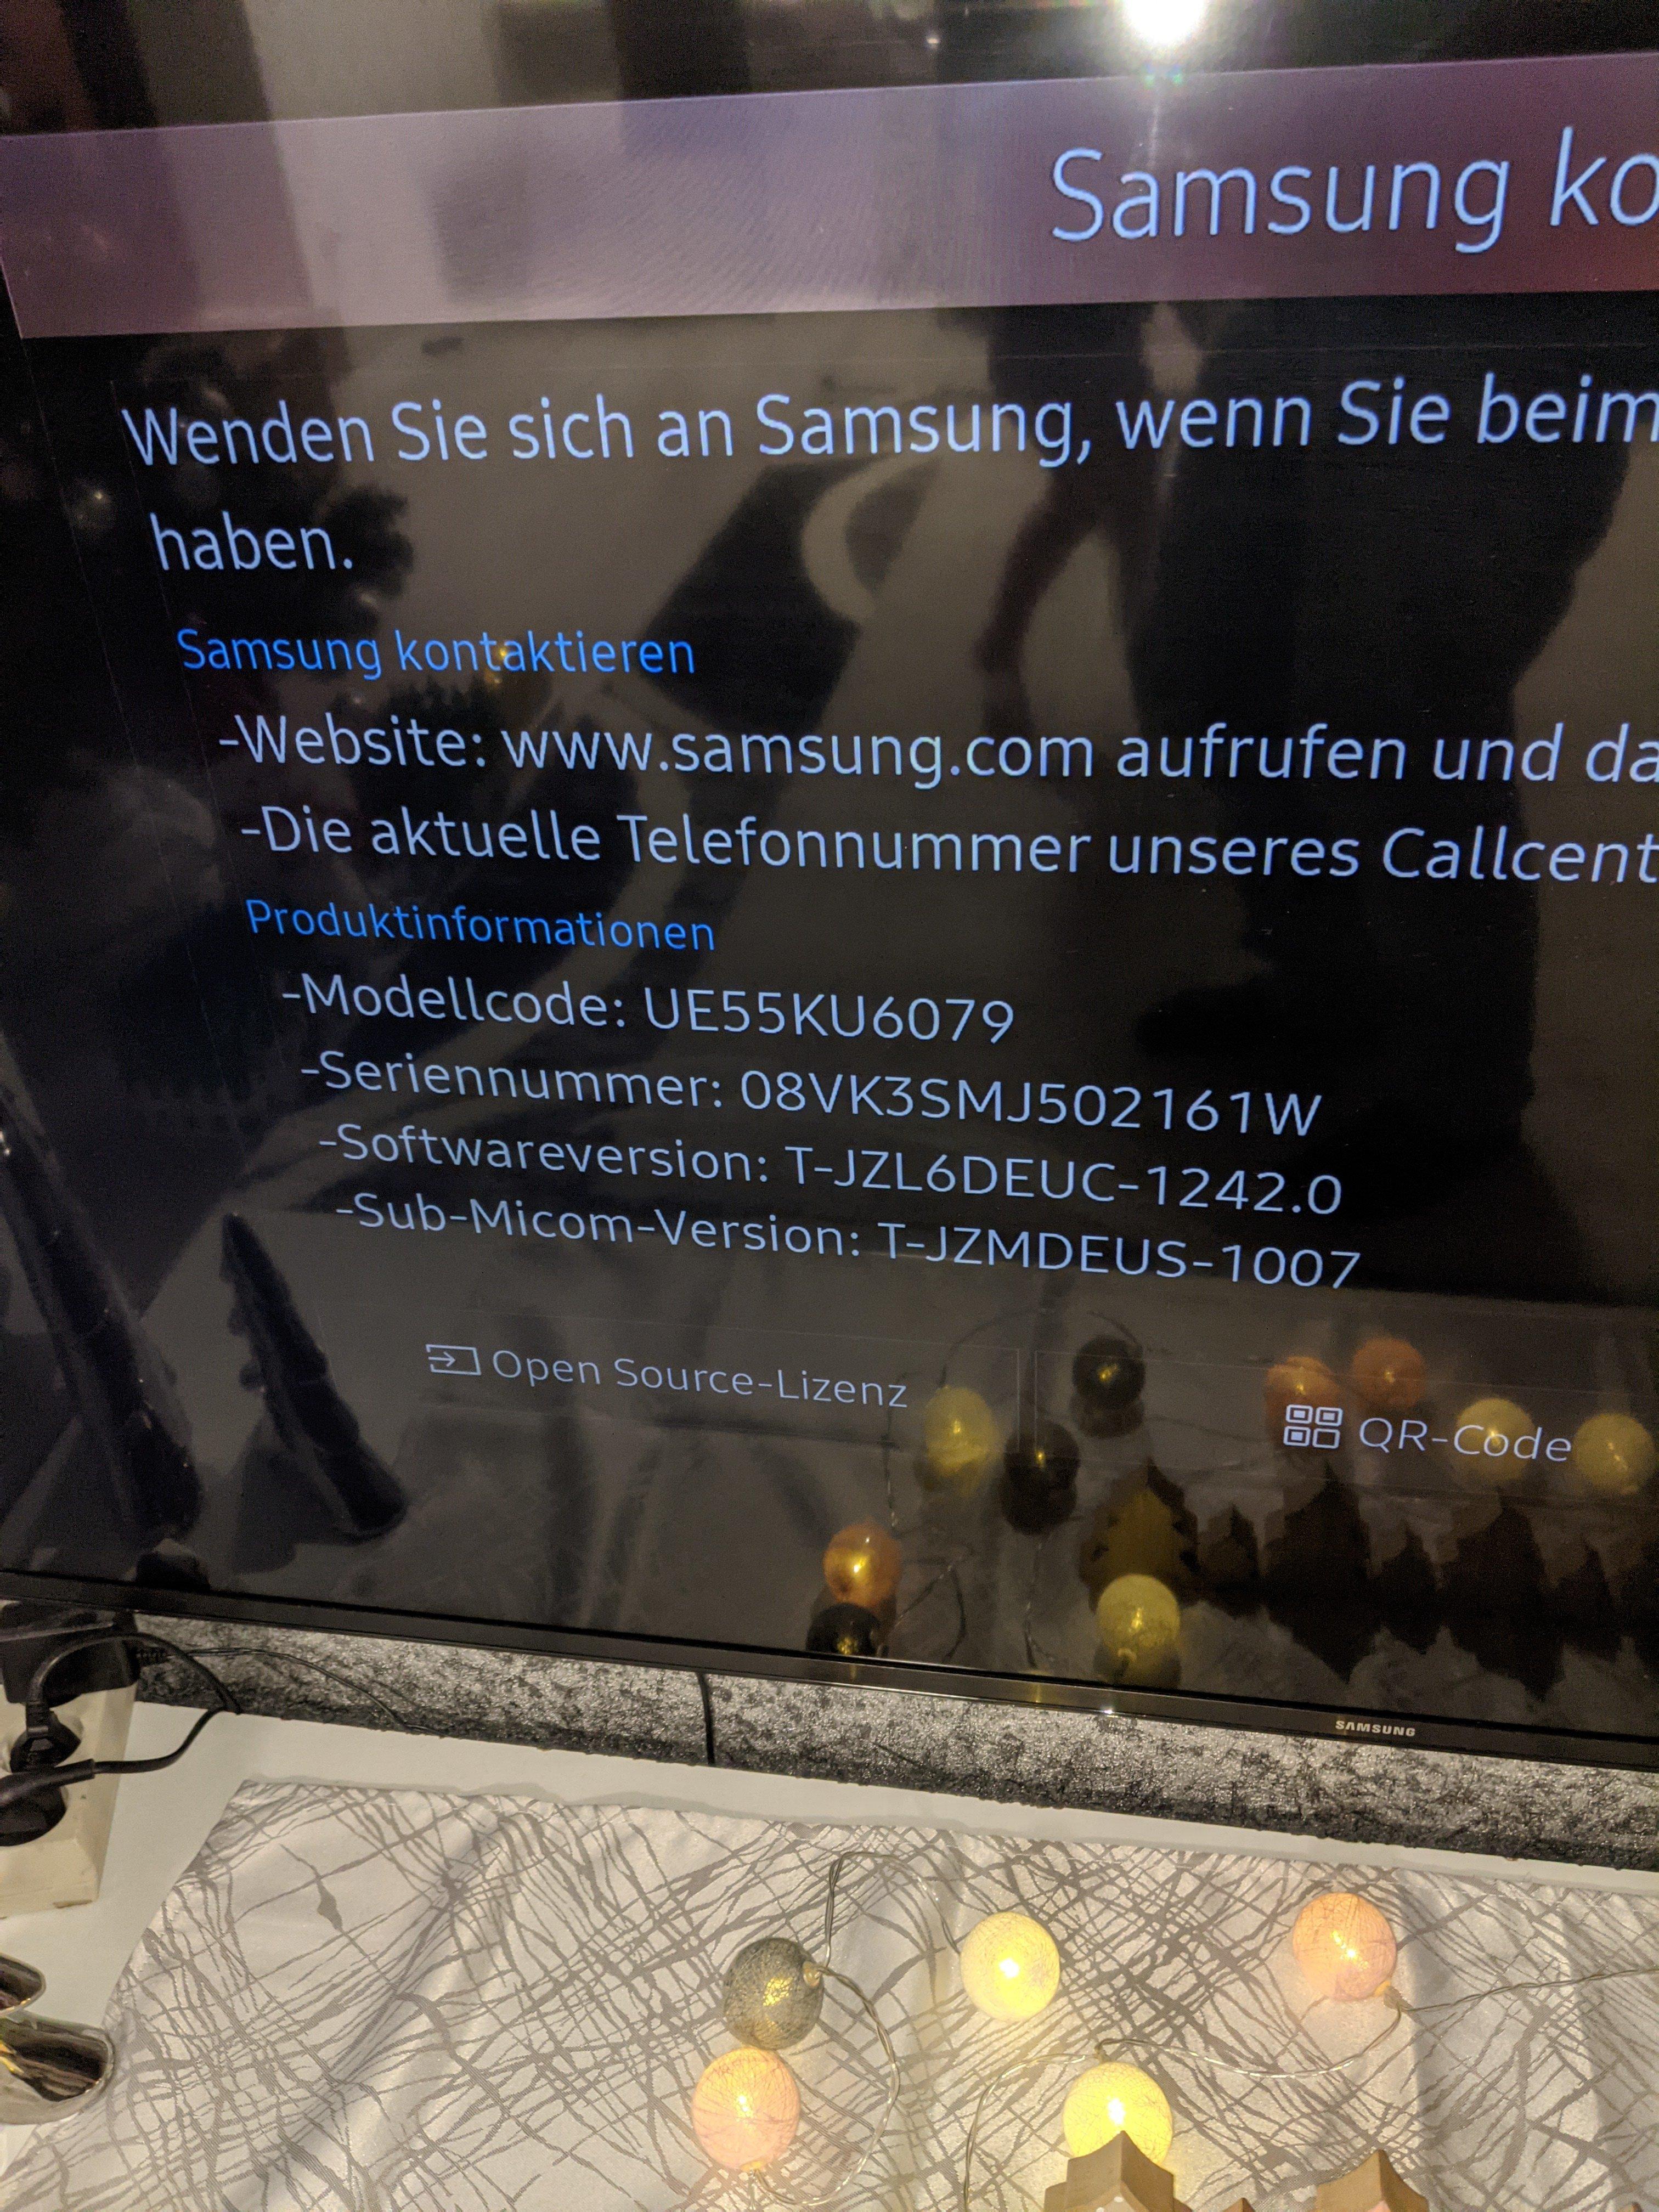 Samsung ip tv kartina smart adresse tv Russian IPTV